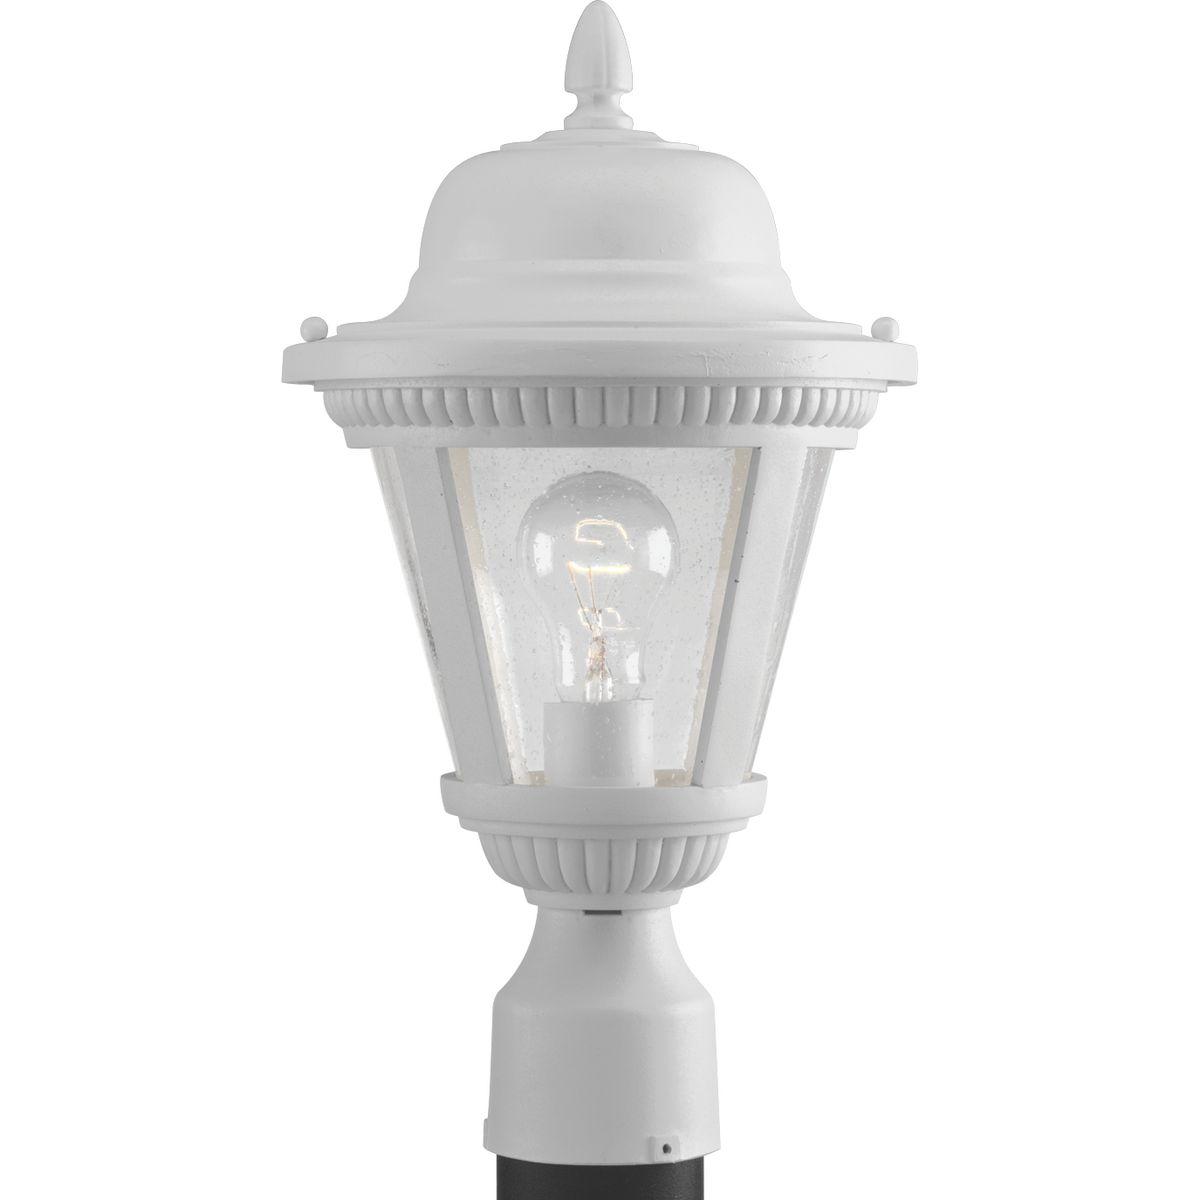 Westport Collection One Light Post Lantern Outdoor